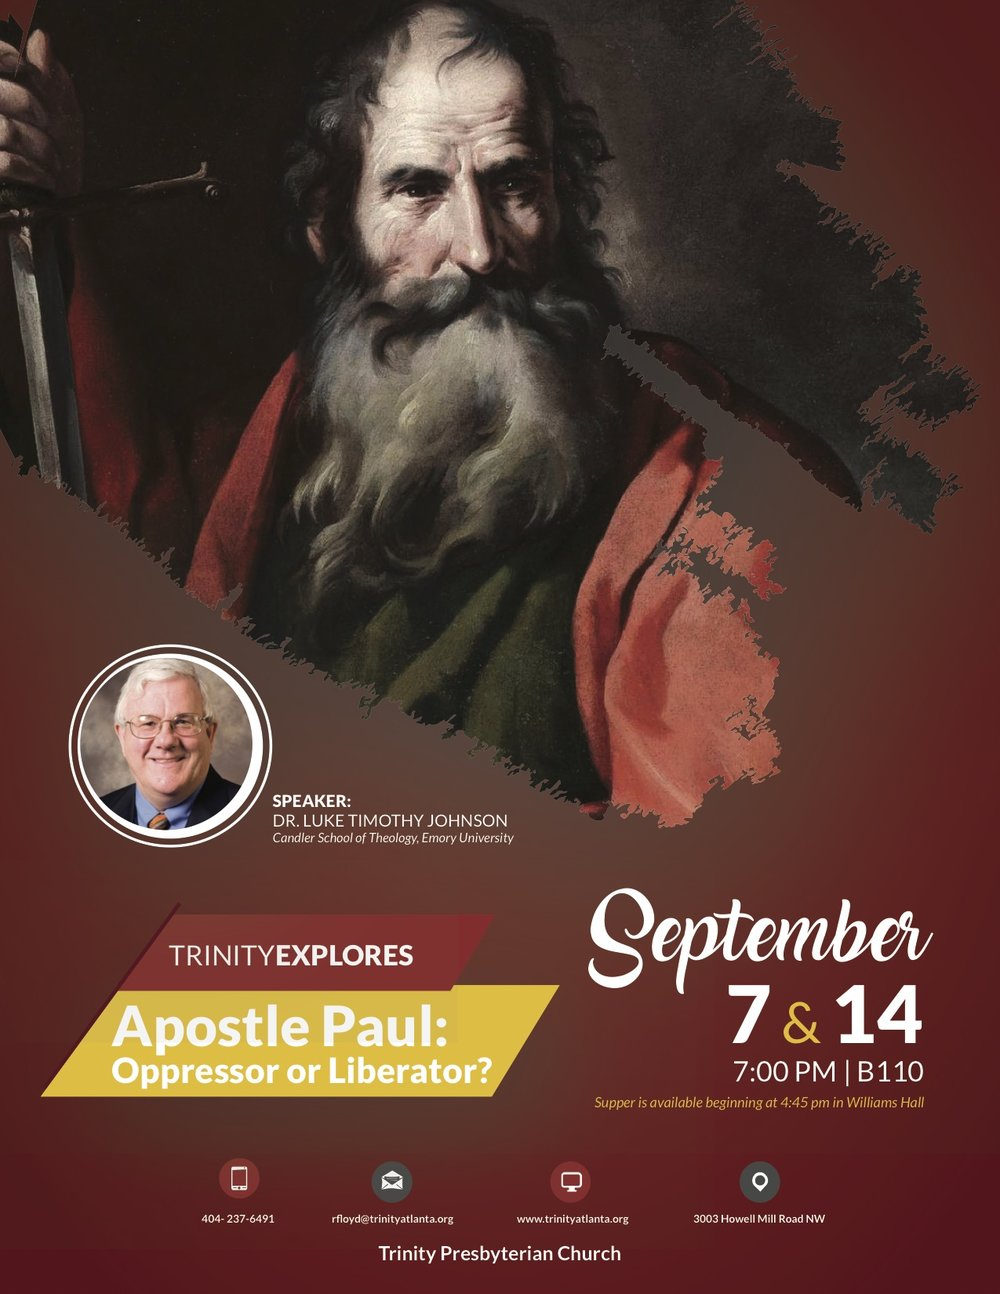 Trinity Explores Apostle Paul.LukeTimothy Johnson Sep2017.jpg